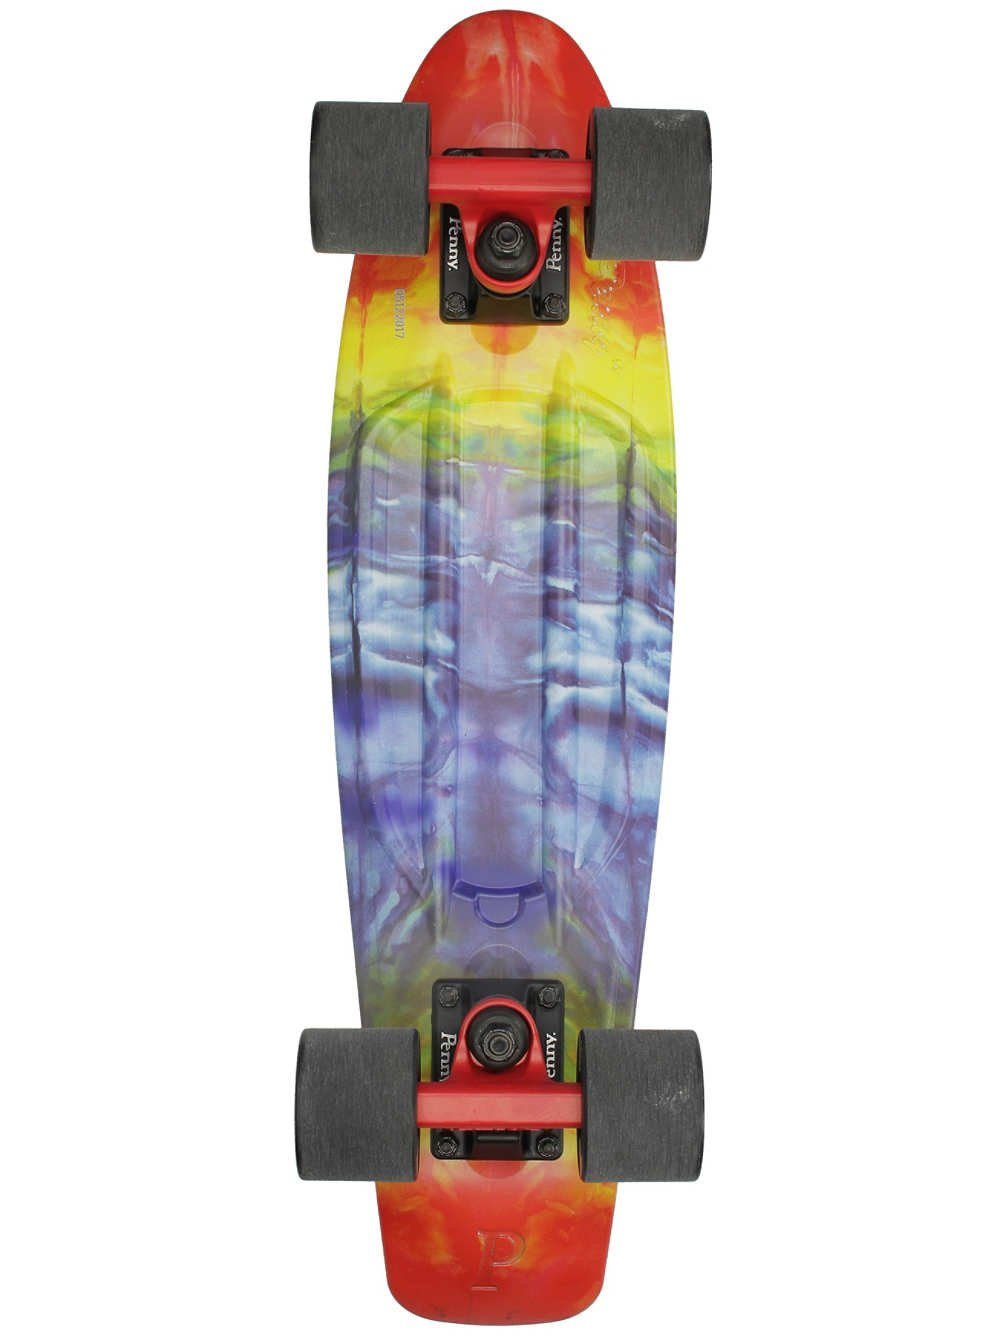 Penny Graphic Skateboard - Rainbow Bridge 22''